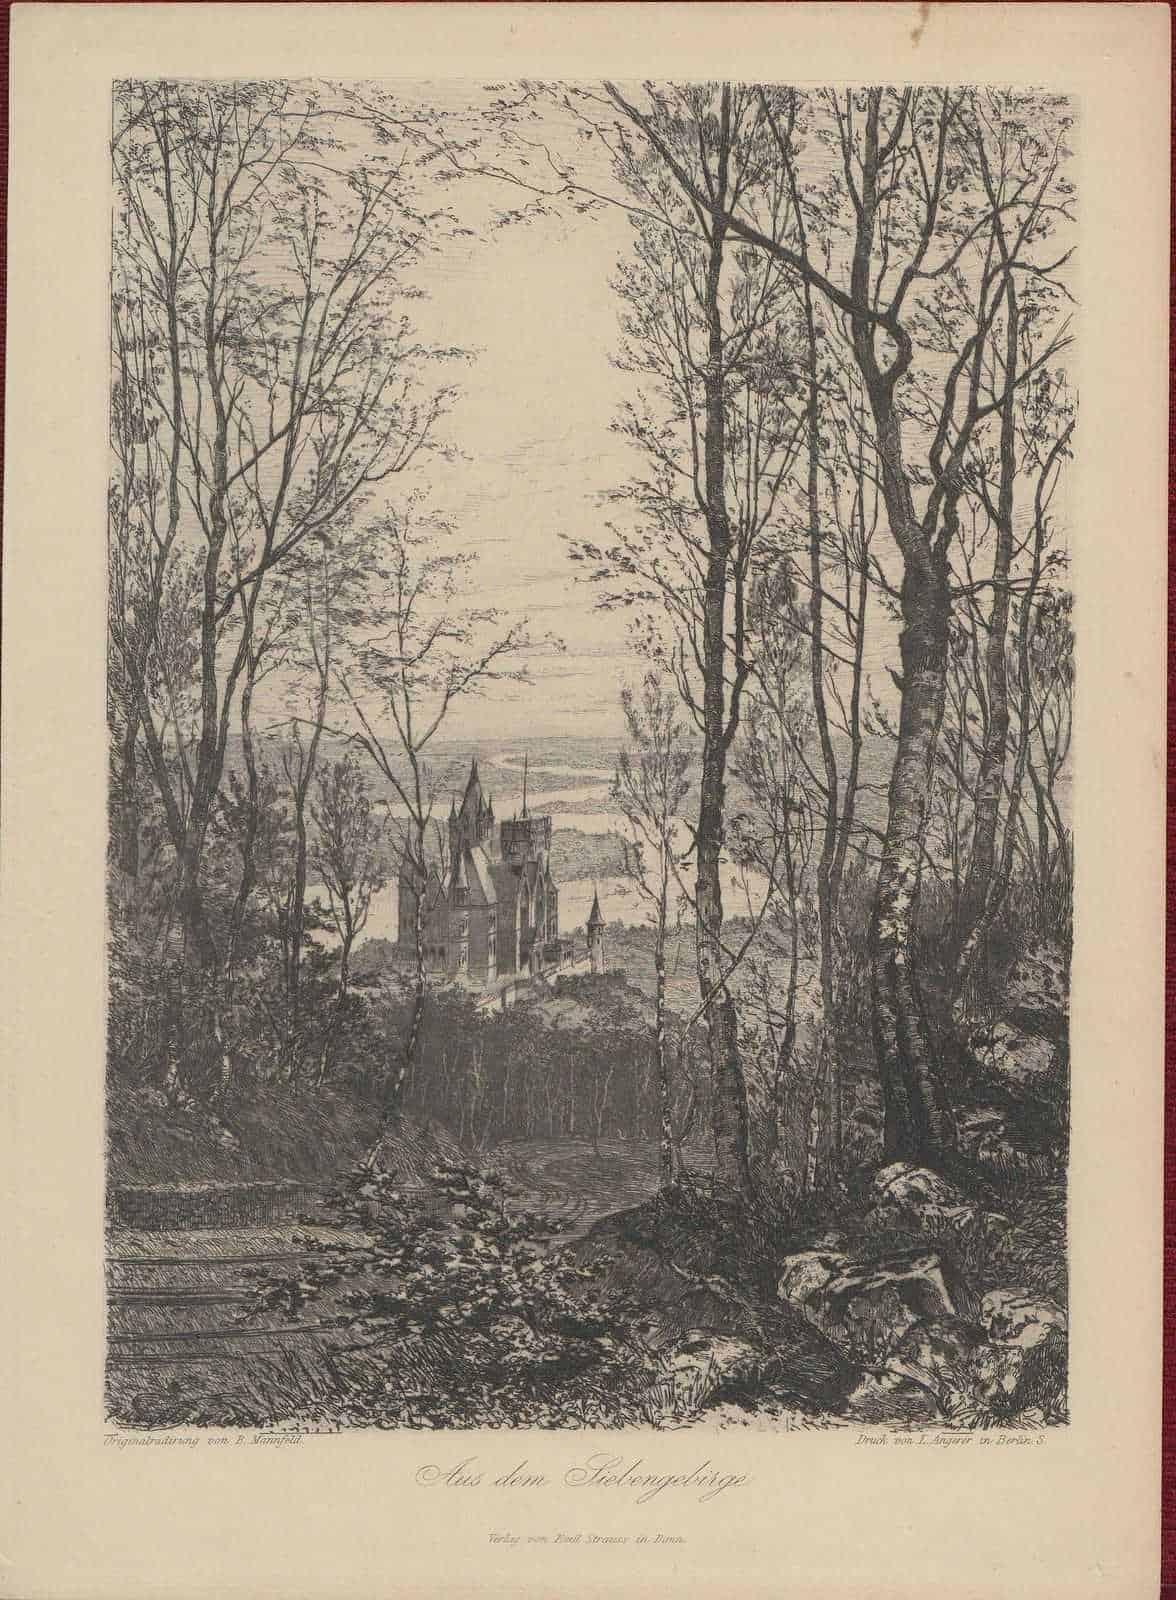 1885-Copperplate-Engraving-Siebengebirge-National-Park-Germany-Bernhard-Mannfeld-182181555132-2